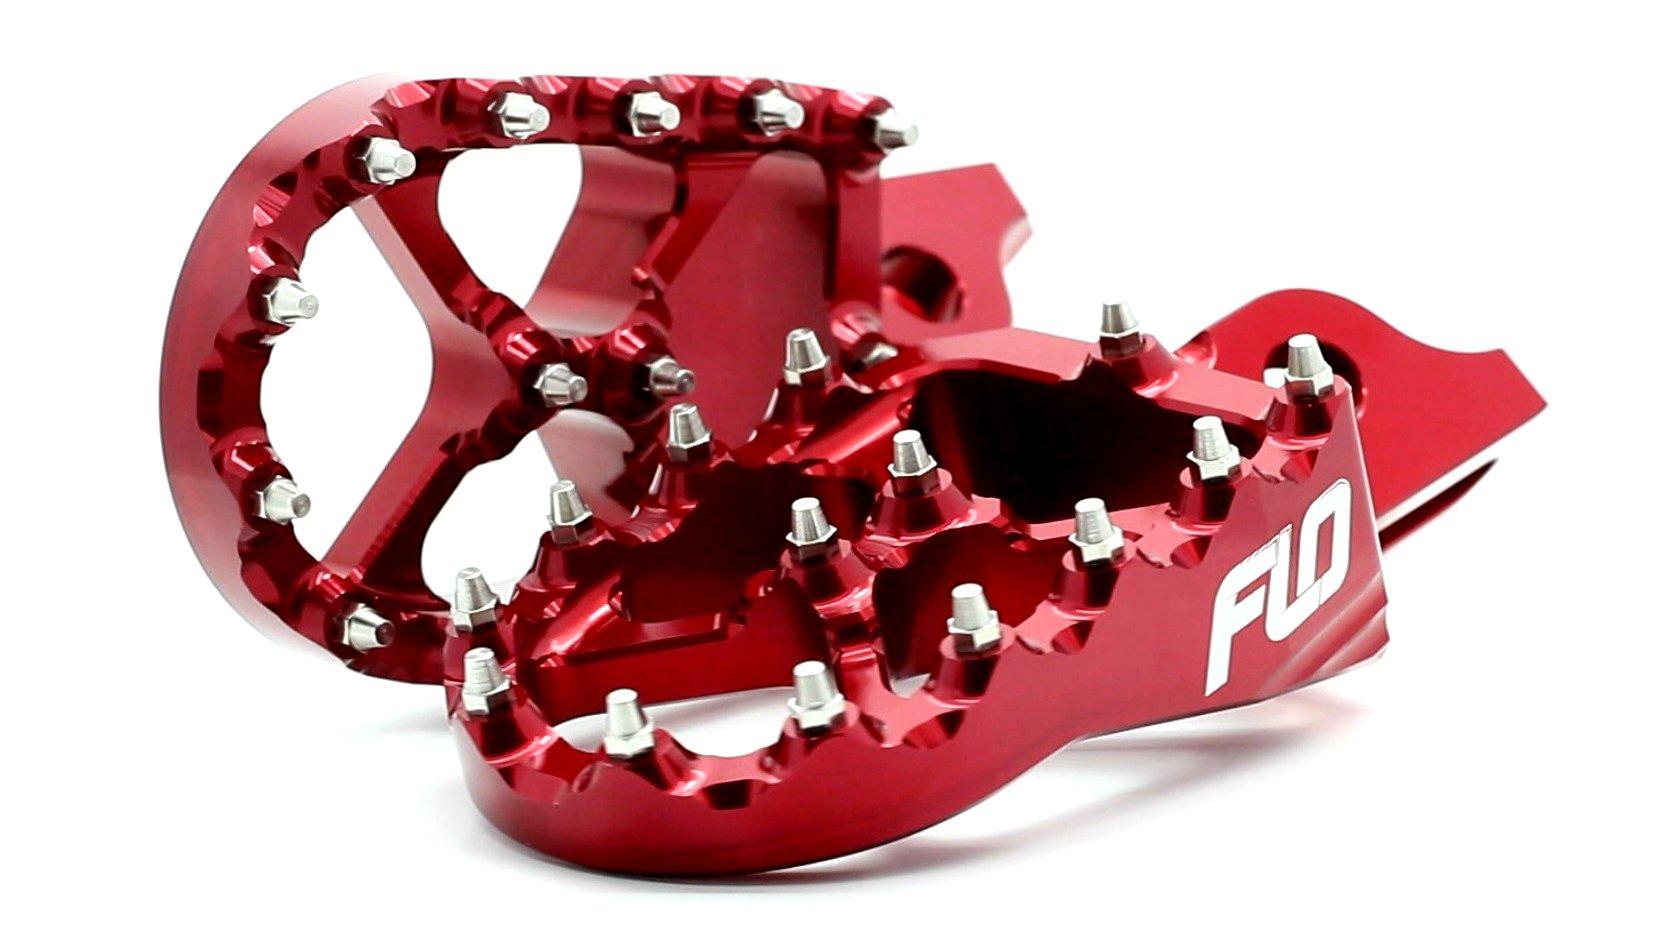 Flo Motorsports Red Suzuki RMZ 250/450 Foot Pegs FPEG-796R